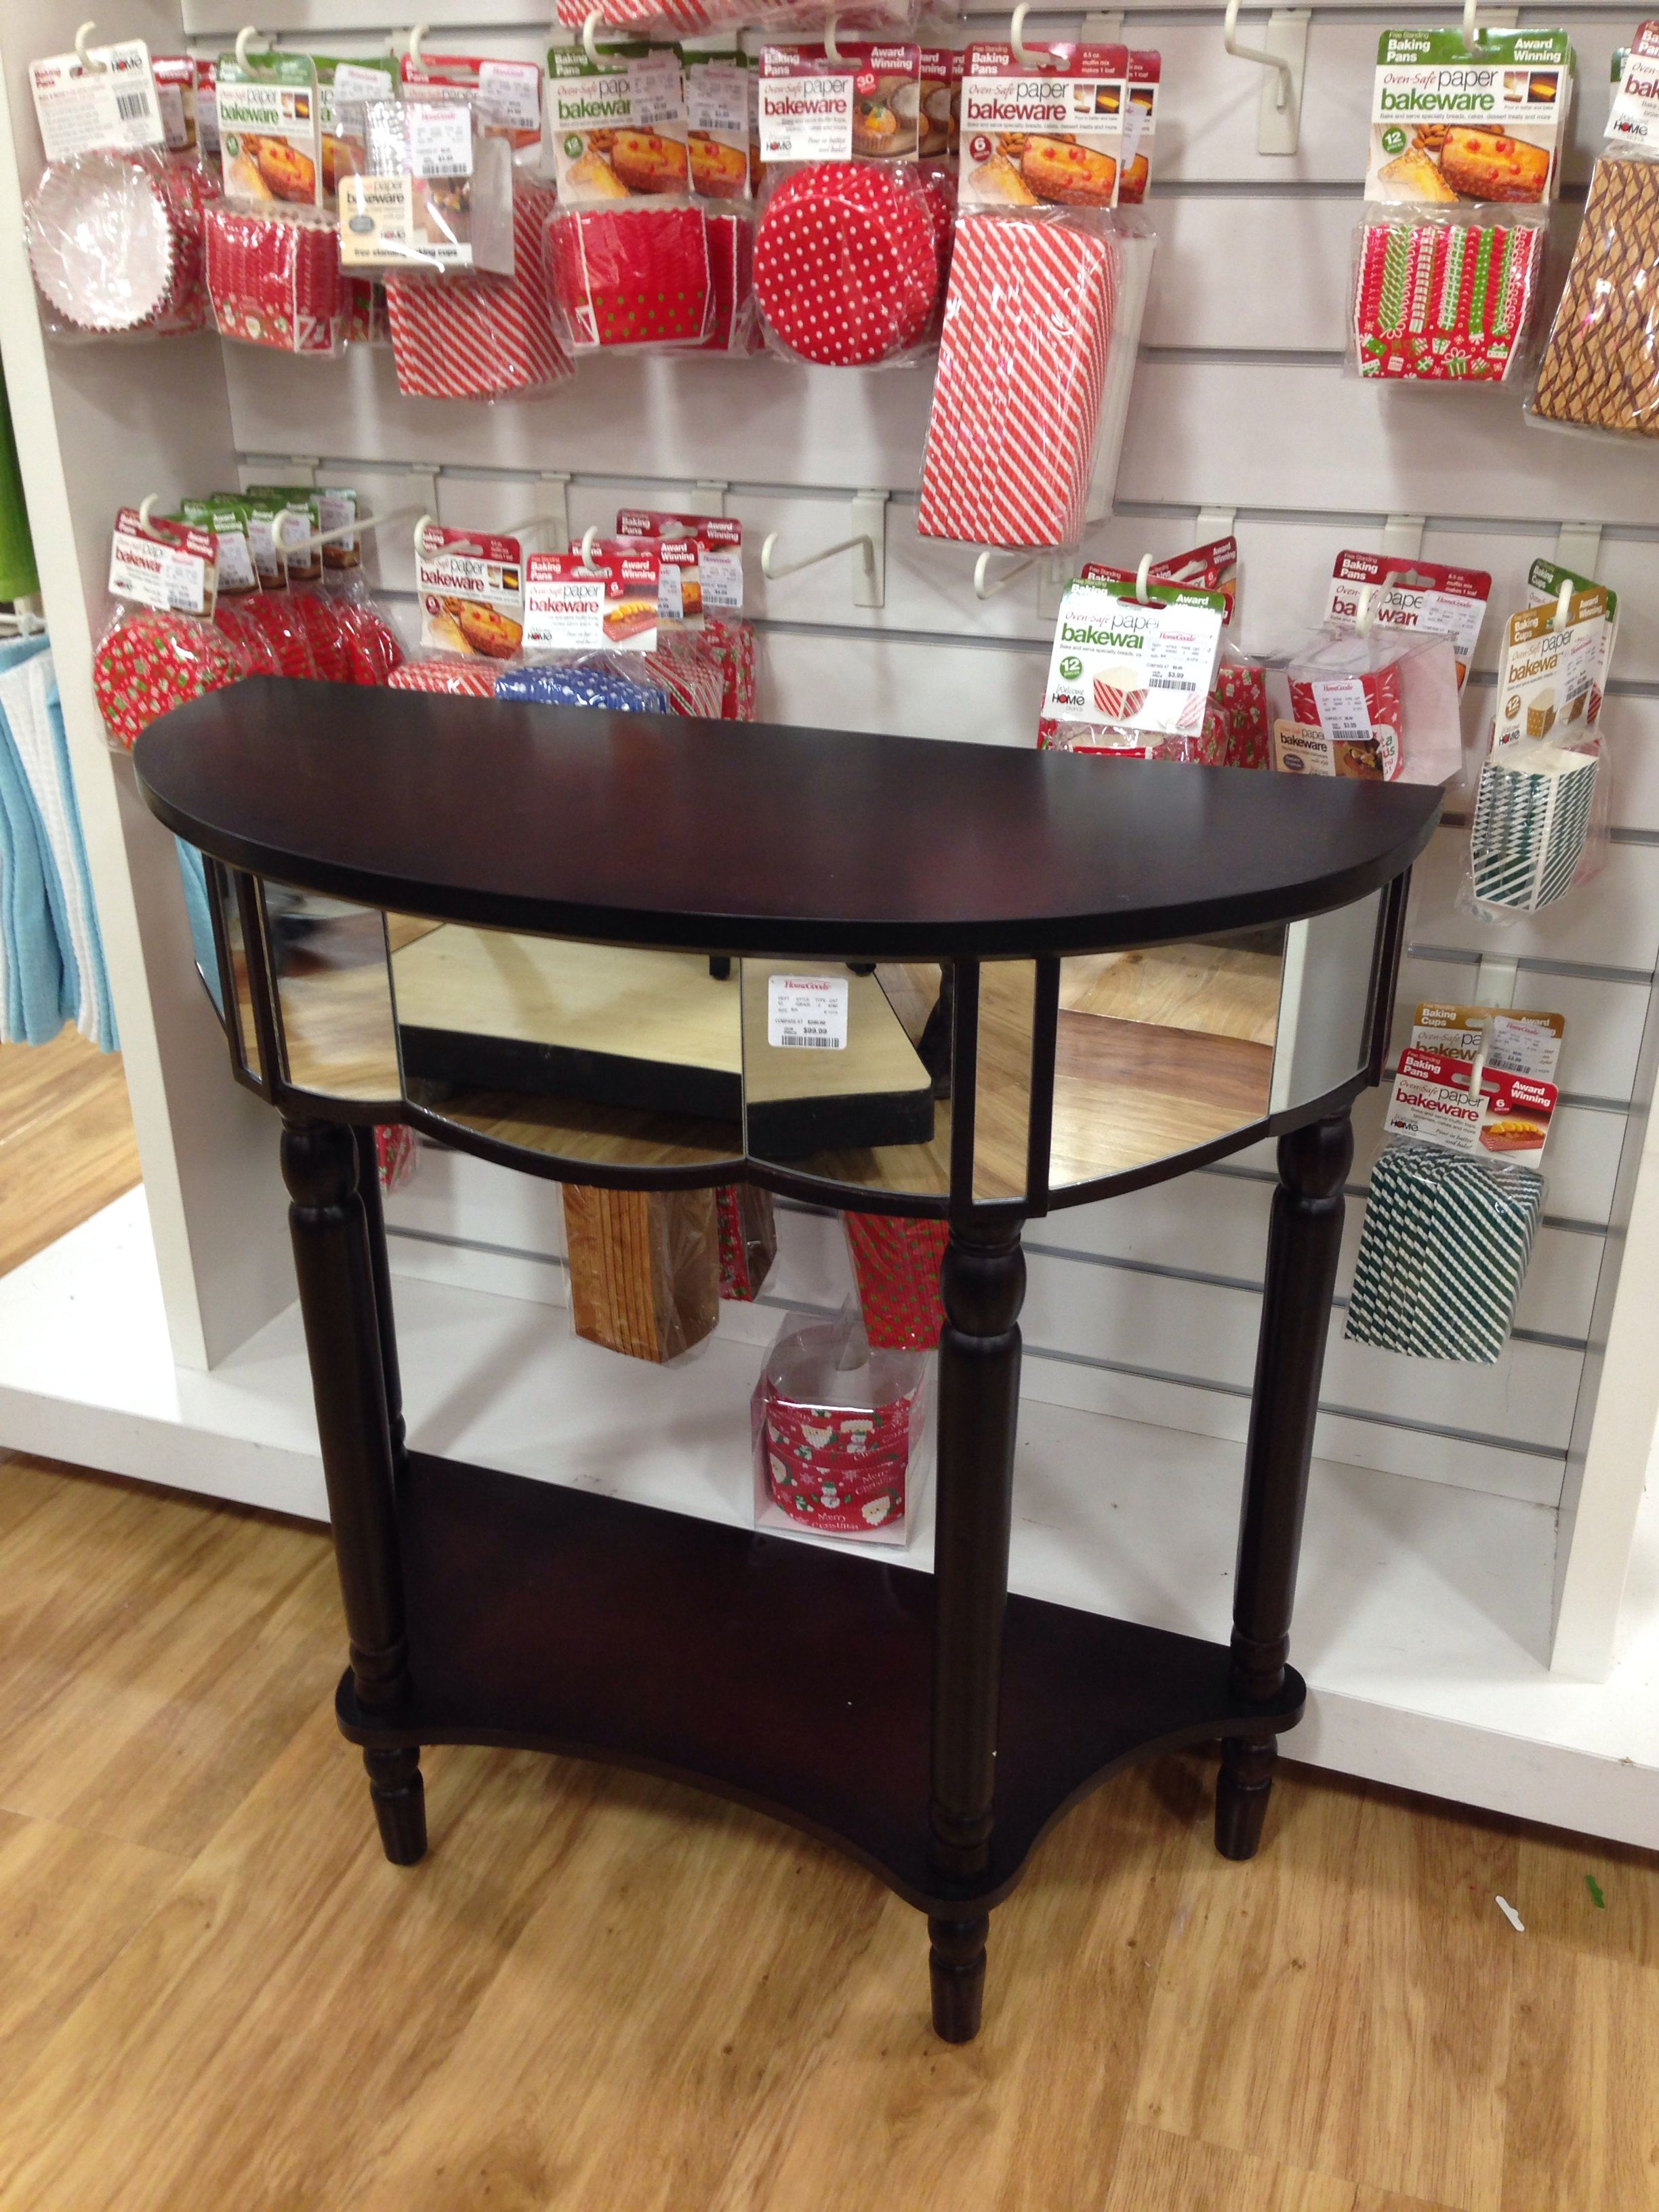 Console table home goods store decor decor design